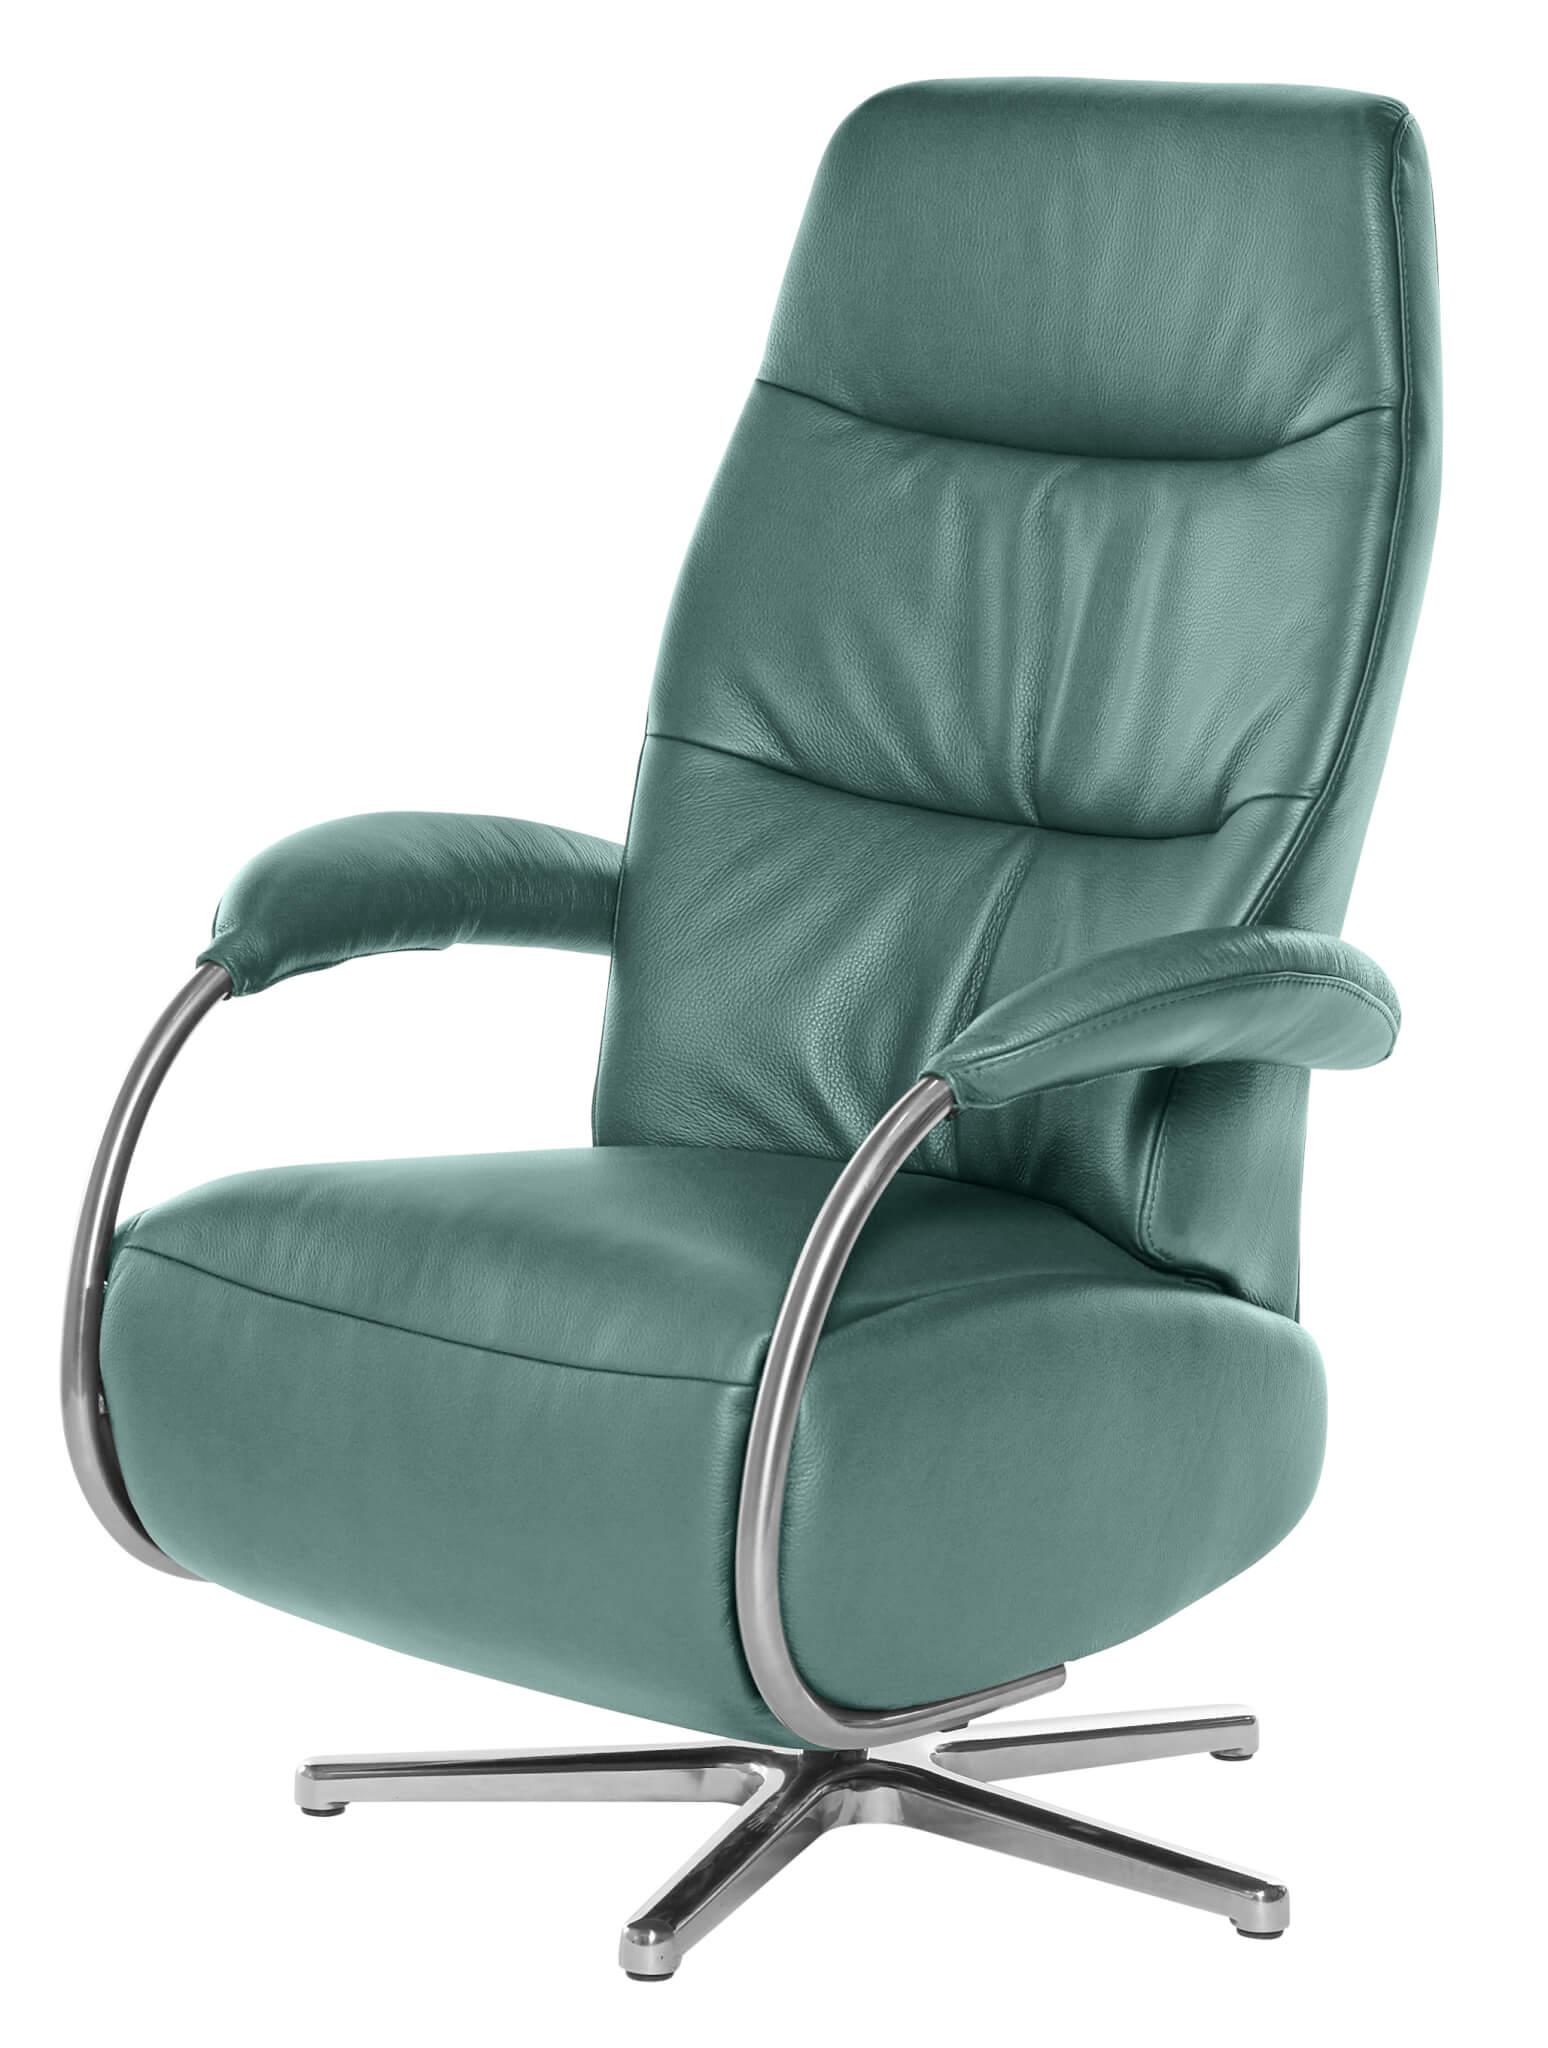 Relaxstoel Easysit D200-7